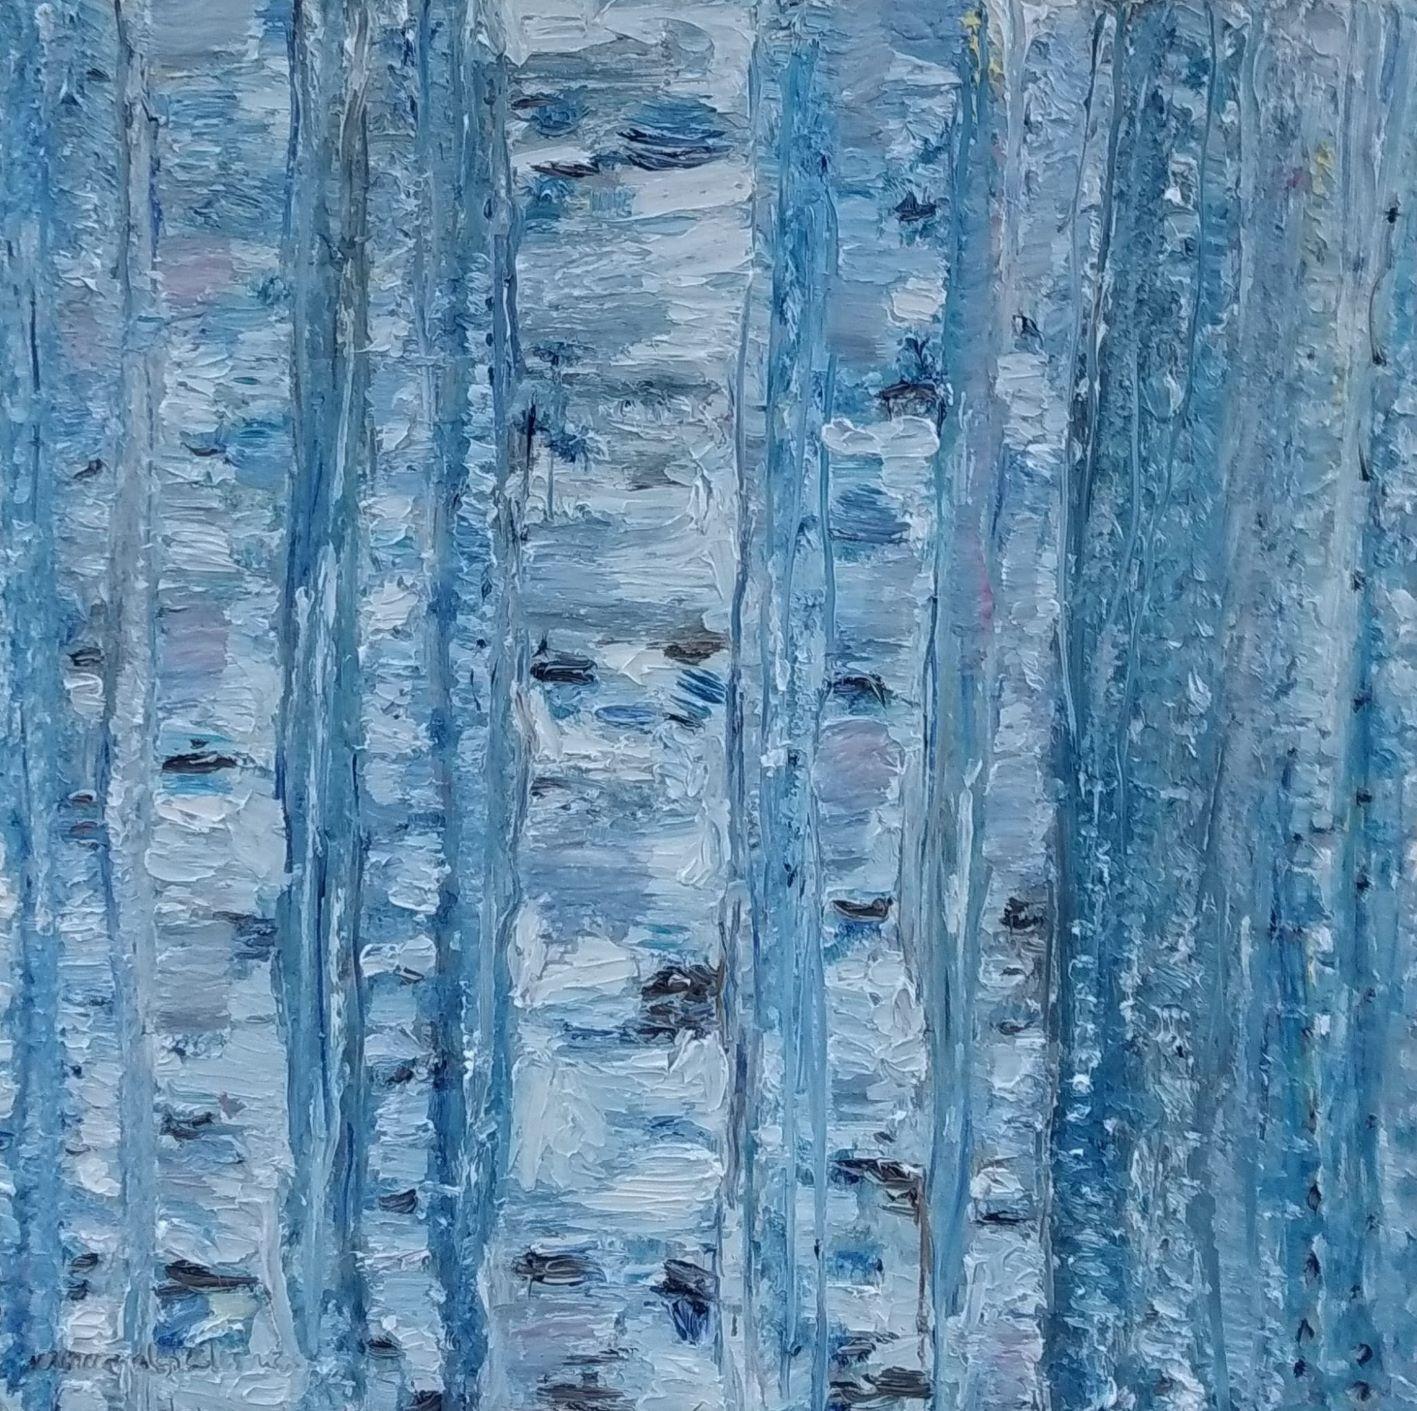 Blue birches II_VeronicaAlonsodelosRios.